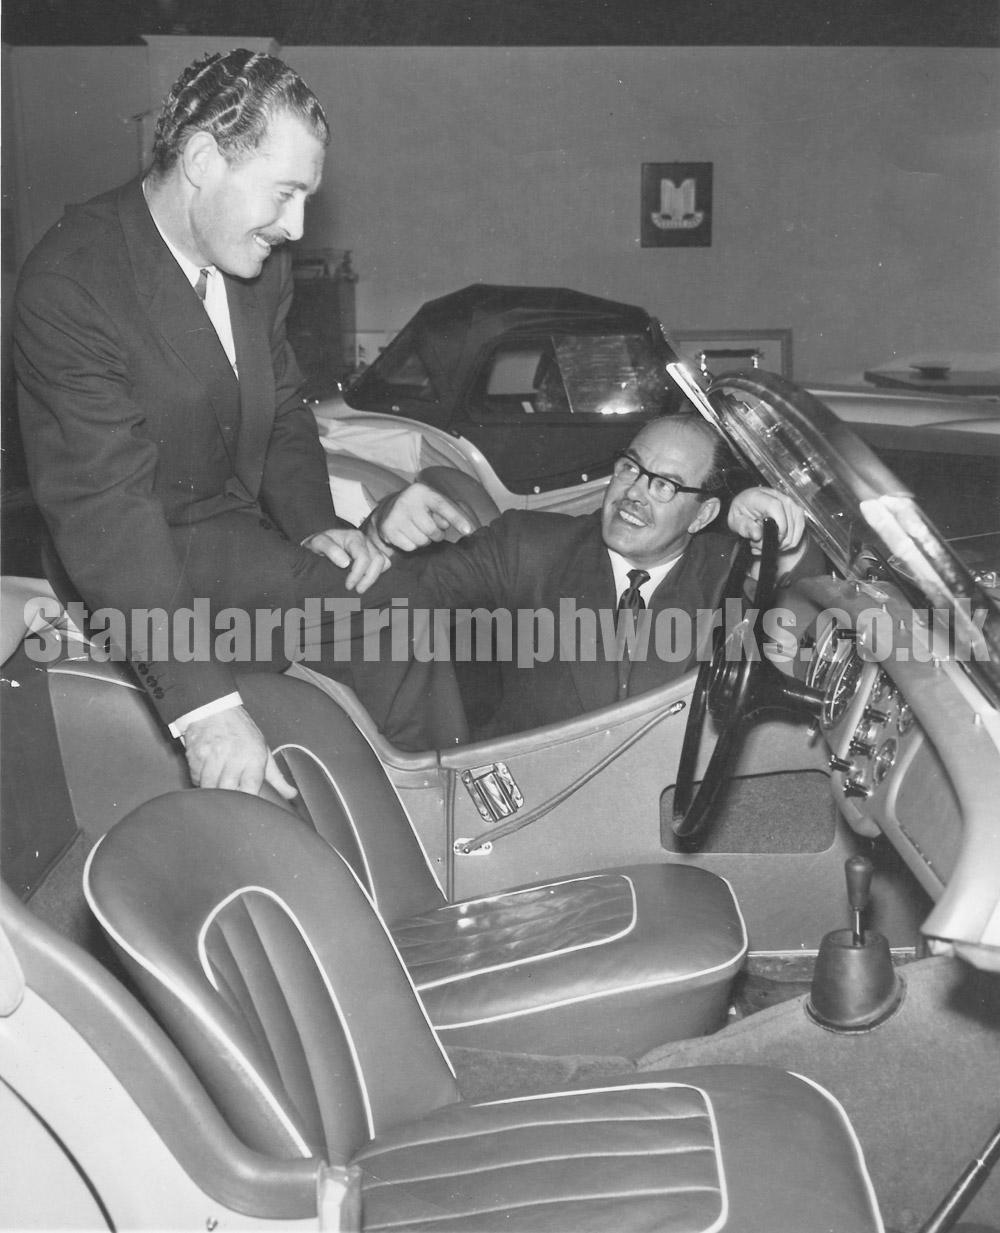 frank gentle Standard Triumph